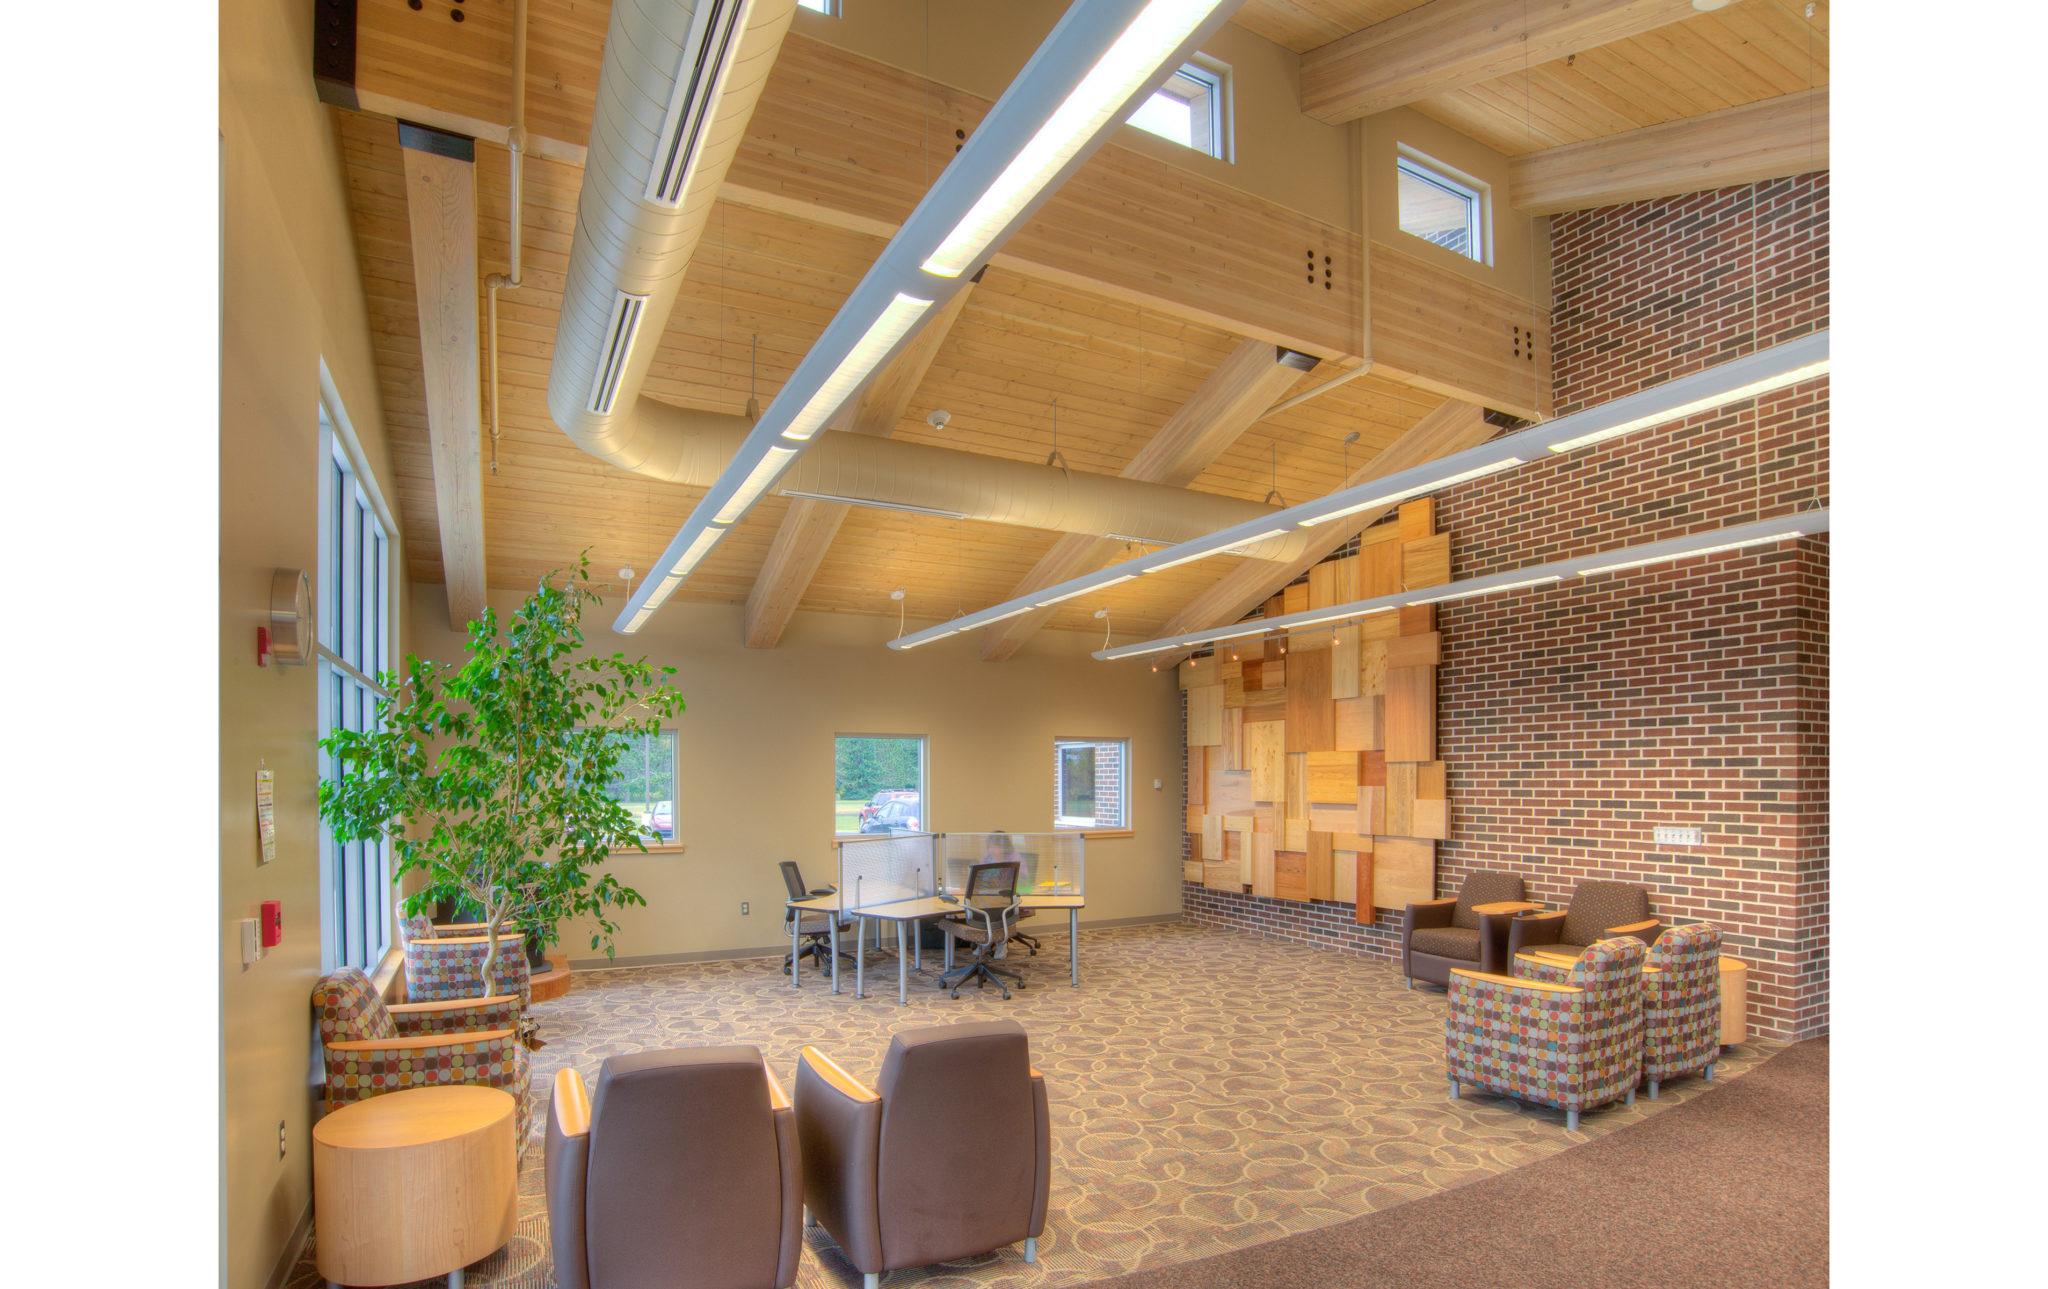 2_NTC-Wood-Technology-Building